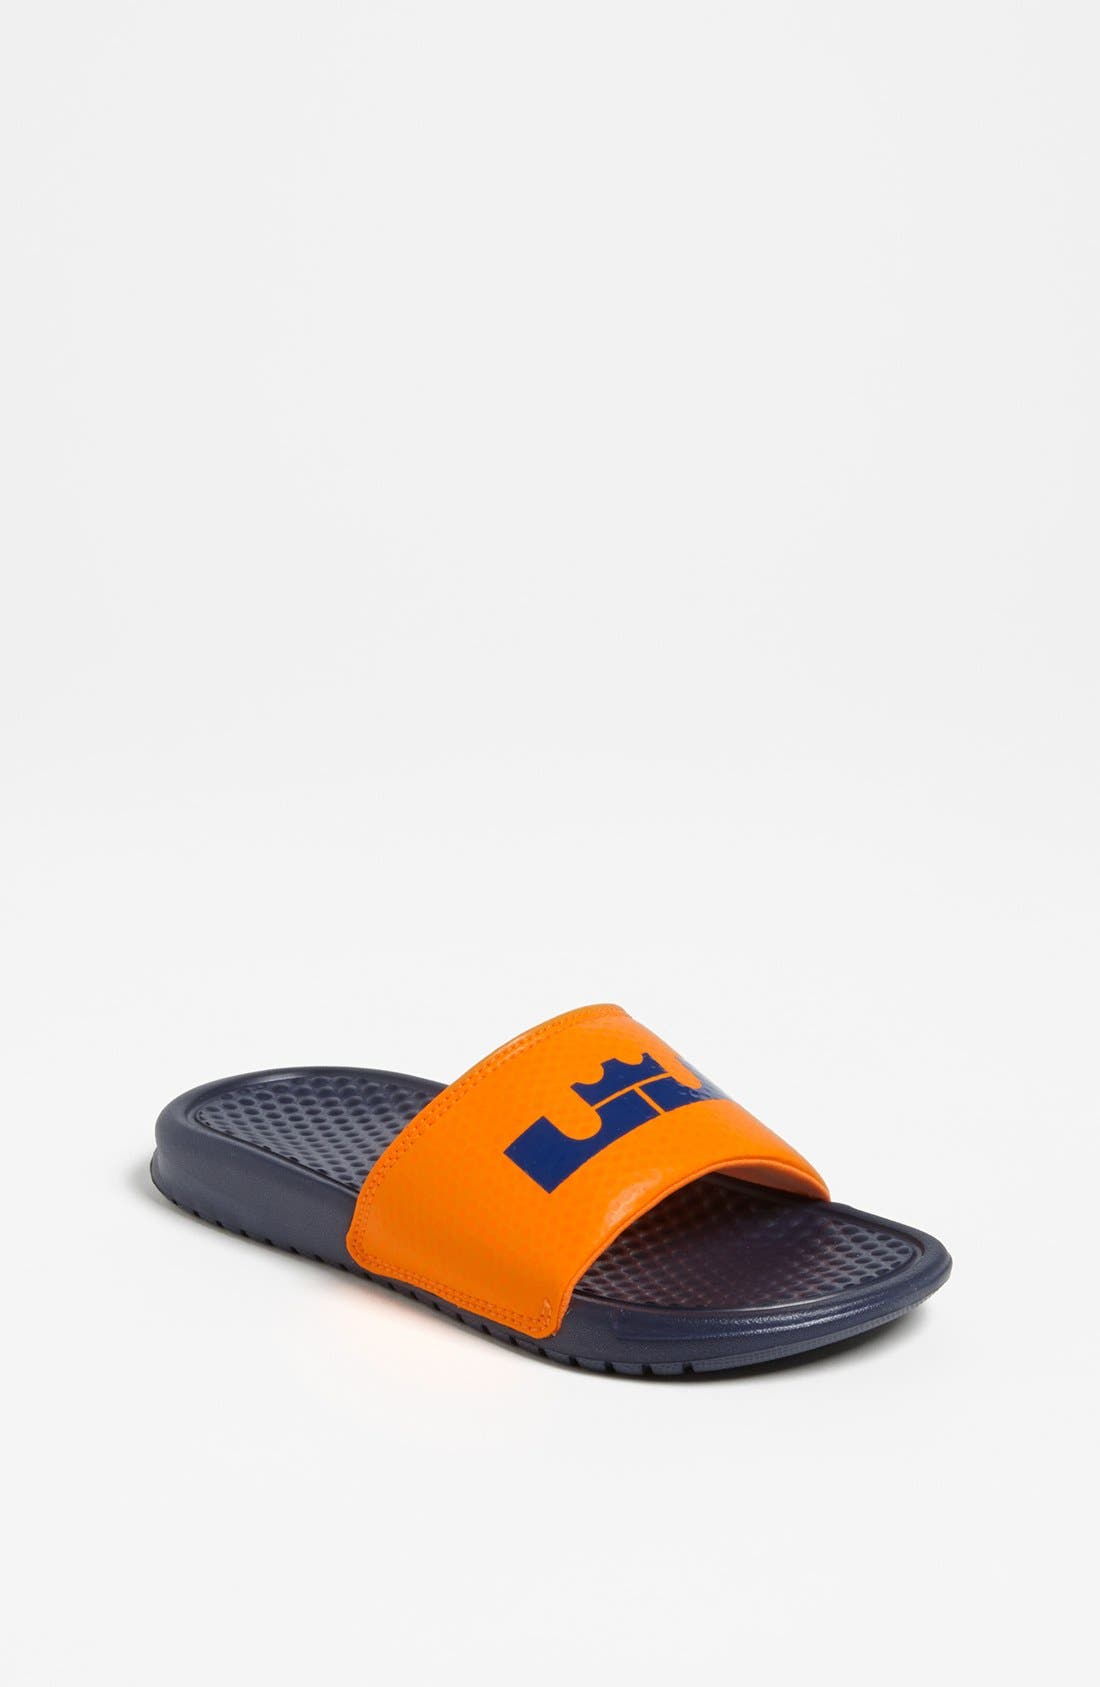 Alternate Image 1 Selected - Nike 'Lebron James - Benassi' Sandal (Toddler, Little Kid & Big Kid)